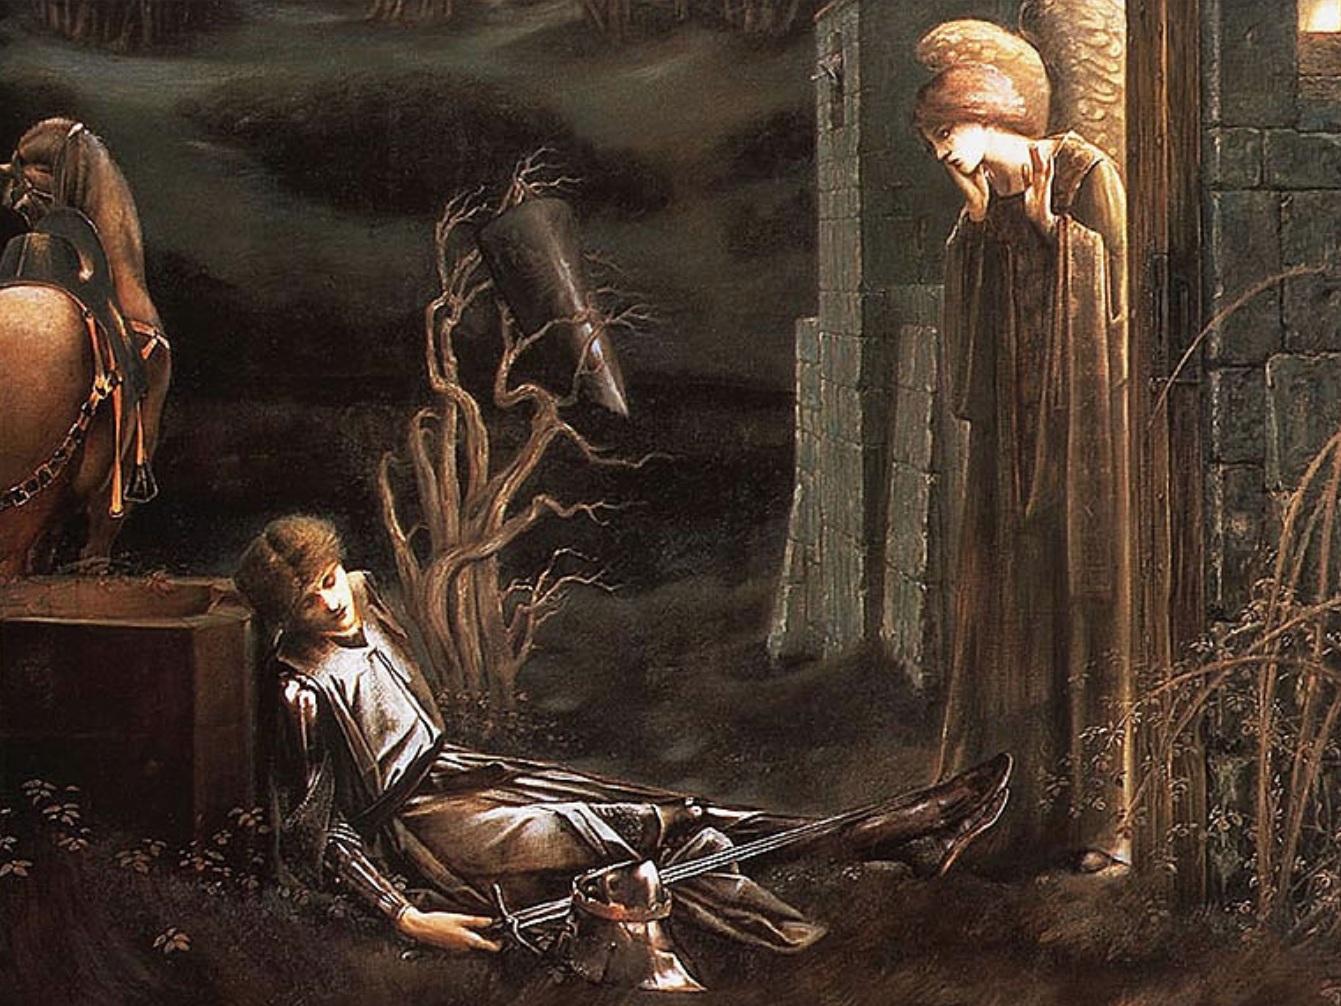 Edward Burne-Jones: Lancelot in the Chapel of the Holy Grail, 1896. Southampton City Art Gallery.